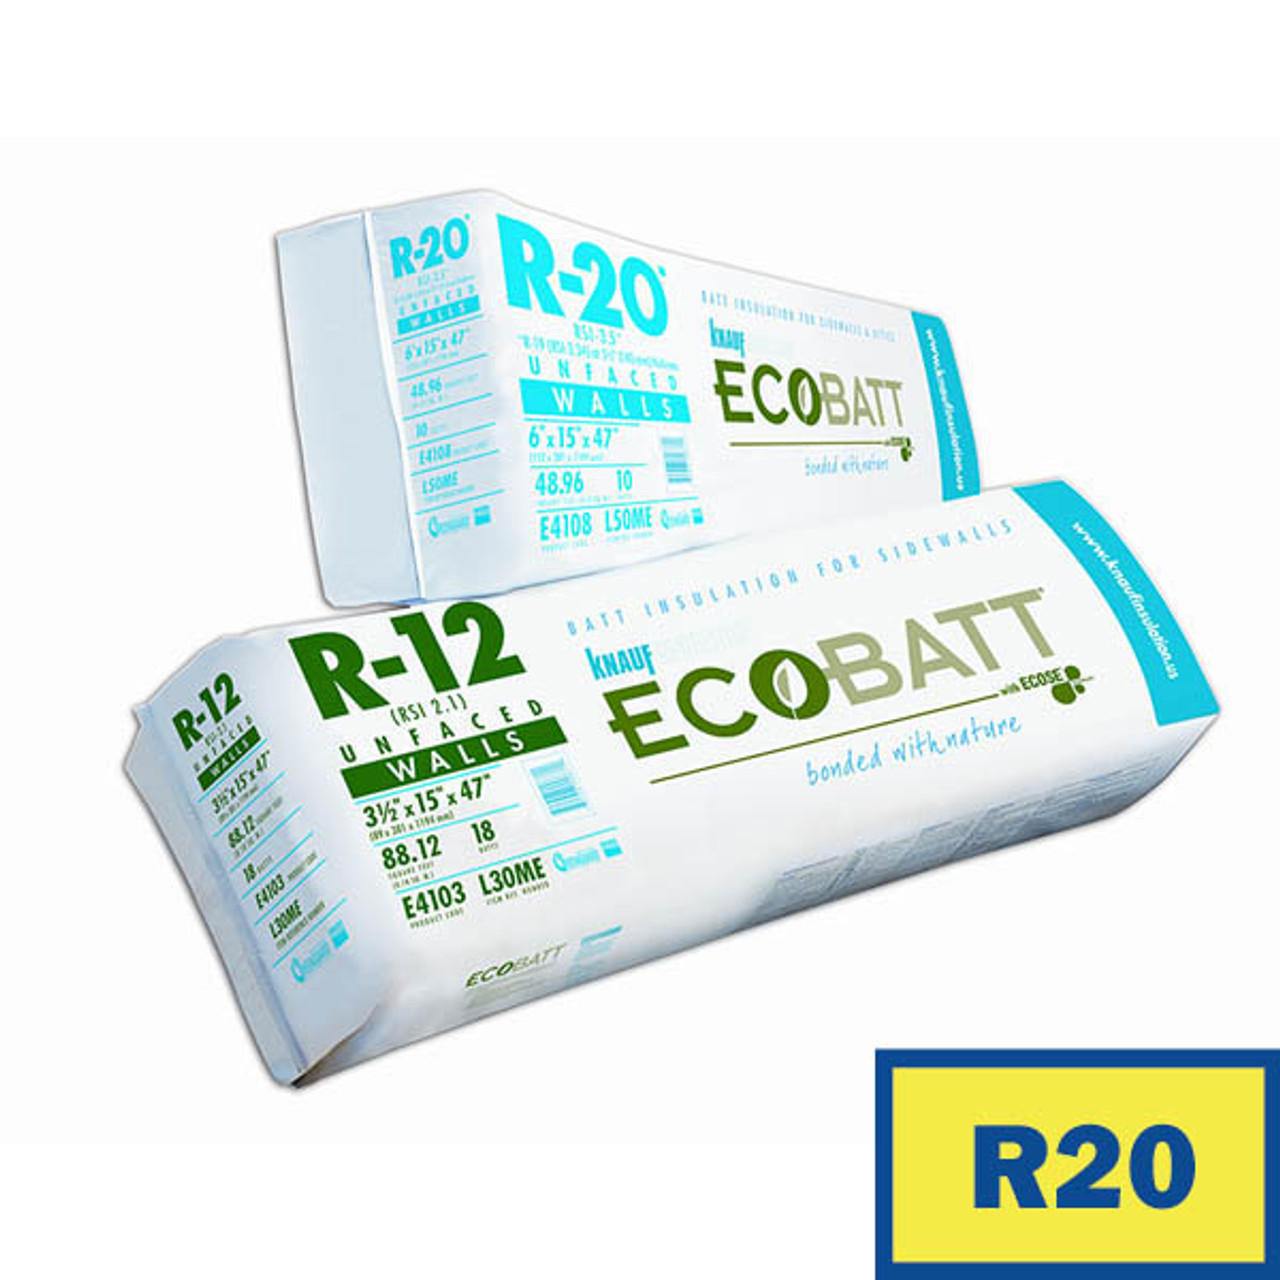 Knauf ECOBATT Insulation   R20 x 23   135.12 Sq.Ft. Per Bundle